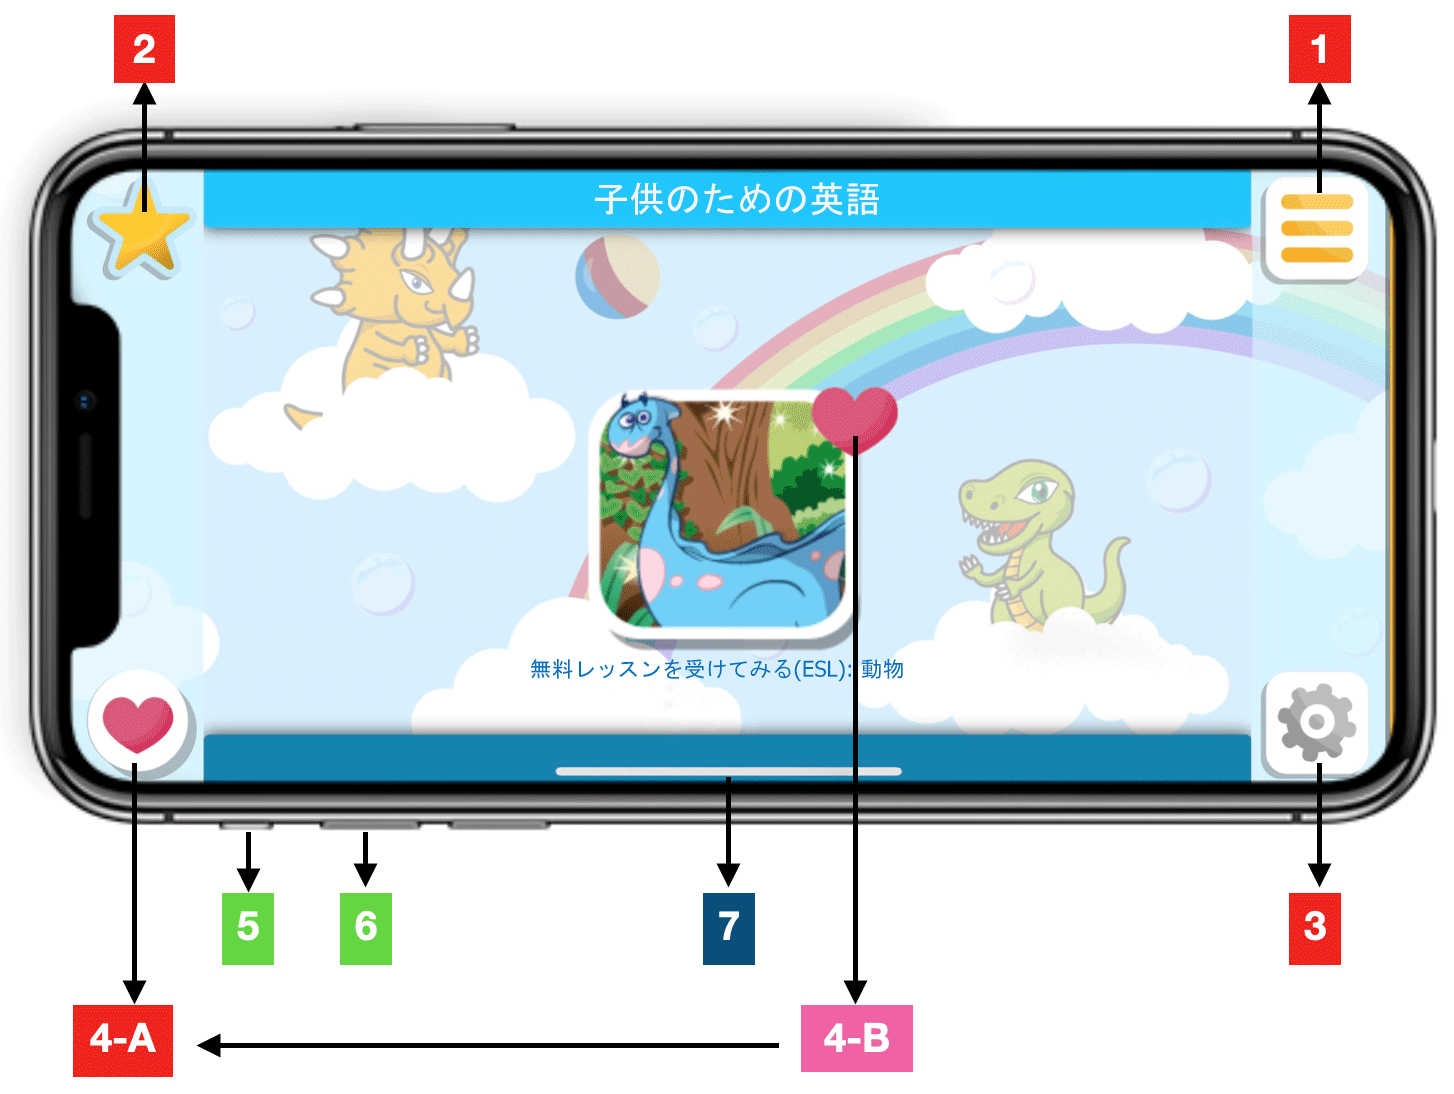 dinolingo-app-instructions-jp